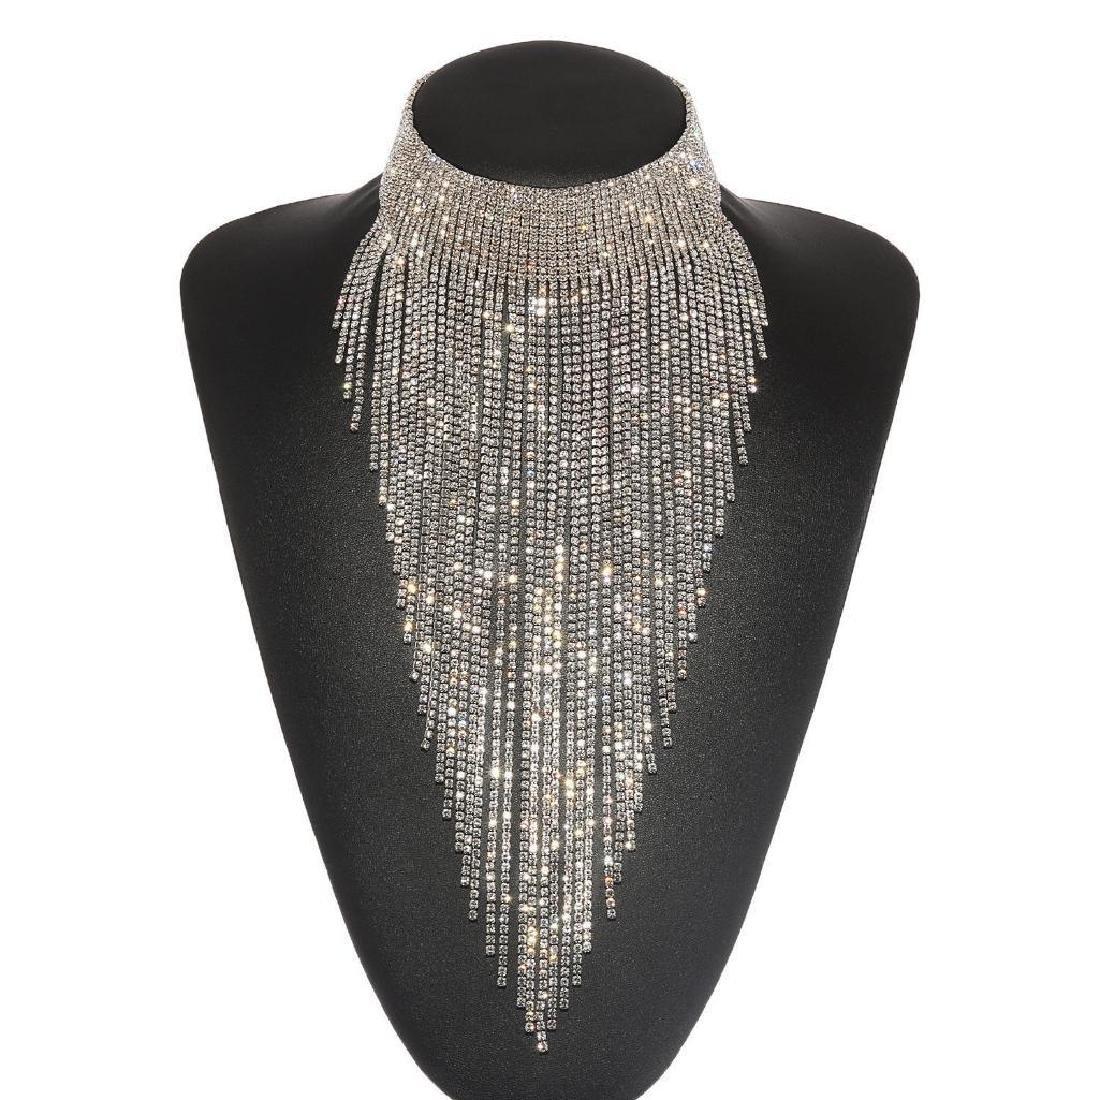 Holylove Charm Rhinestone Tassels Choker Collar Pendant